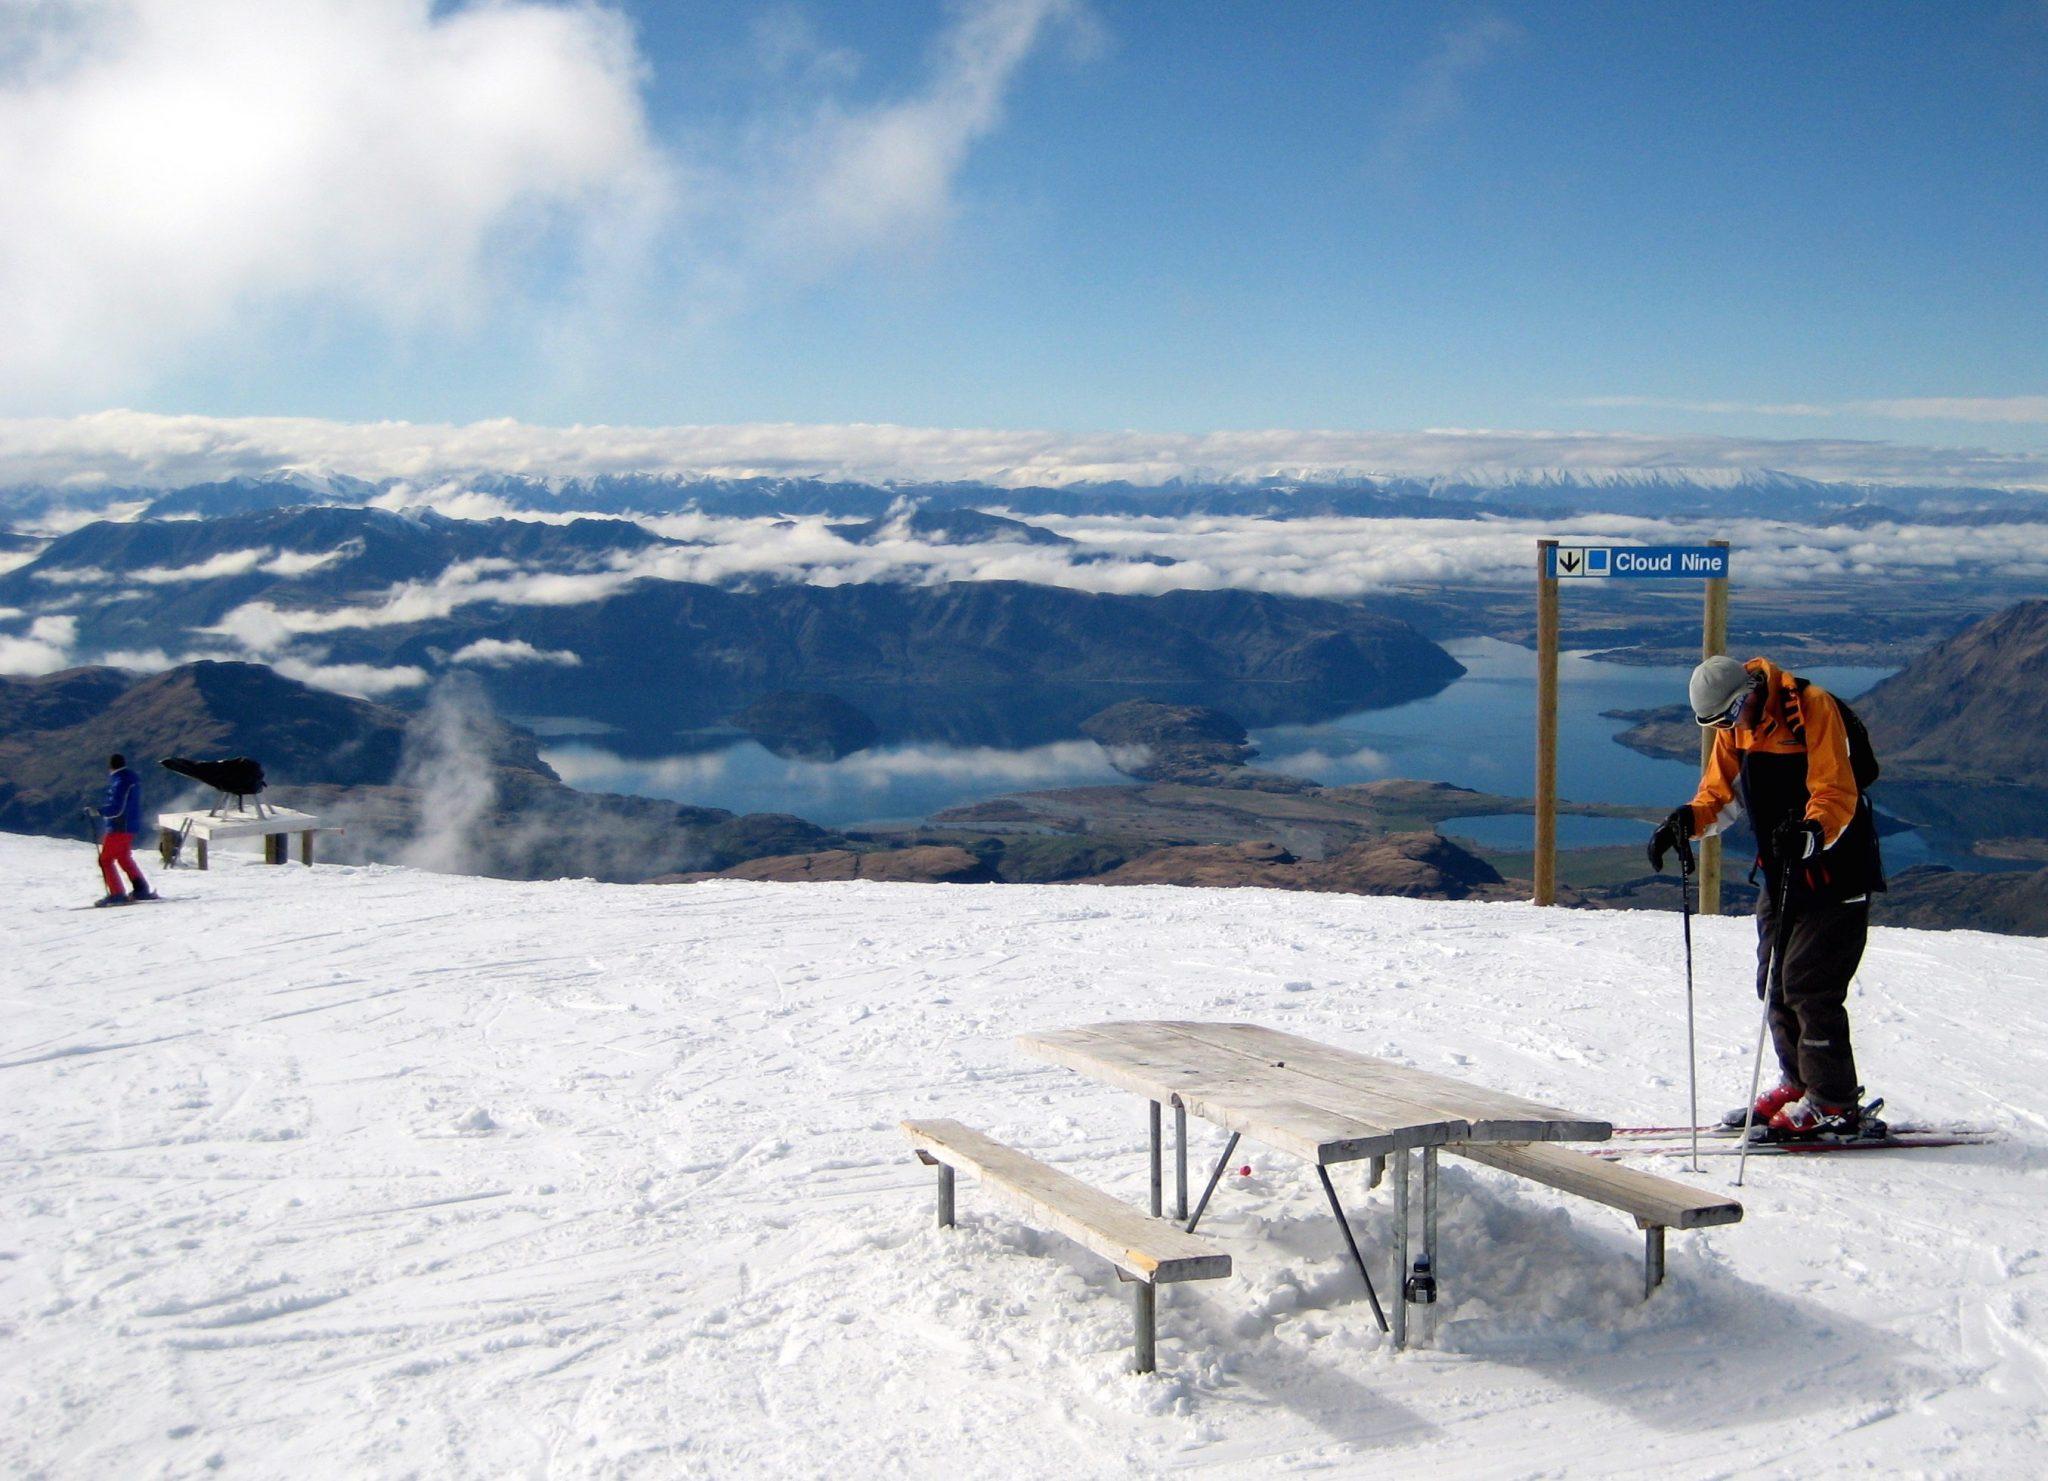 Winter in Wanaka - South Island, New Zealand